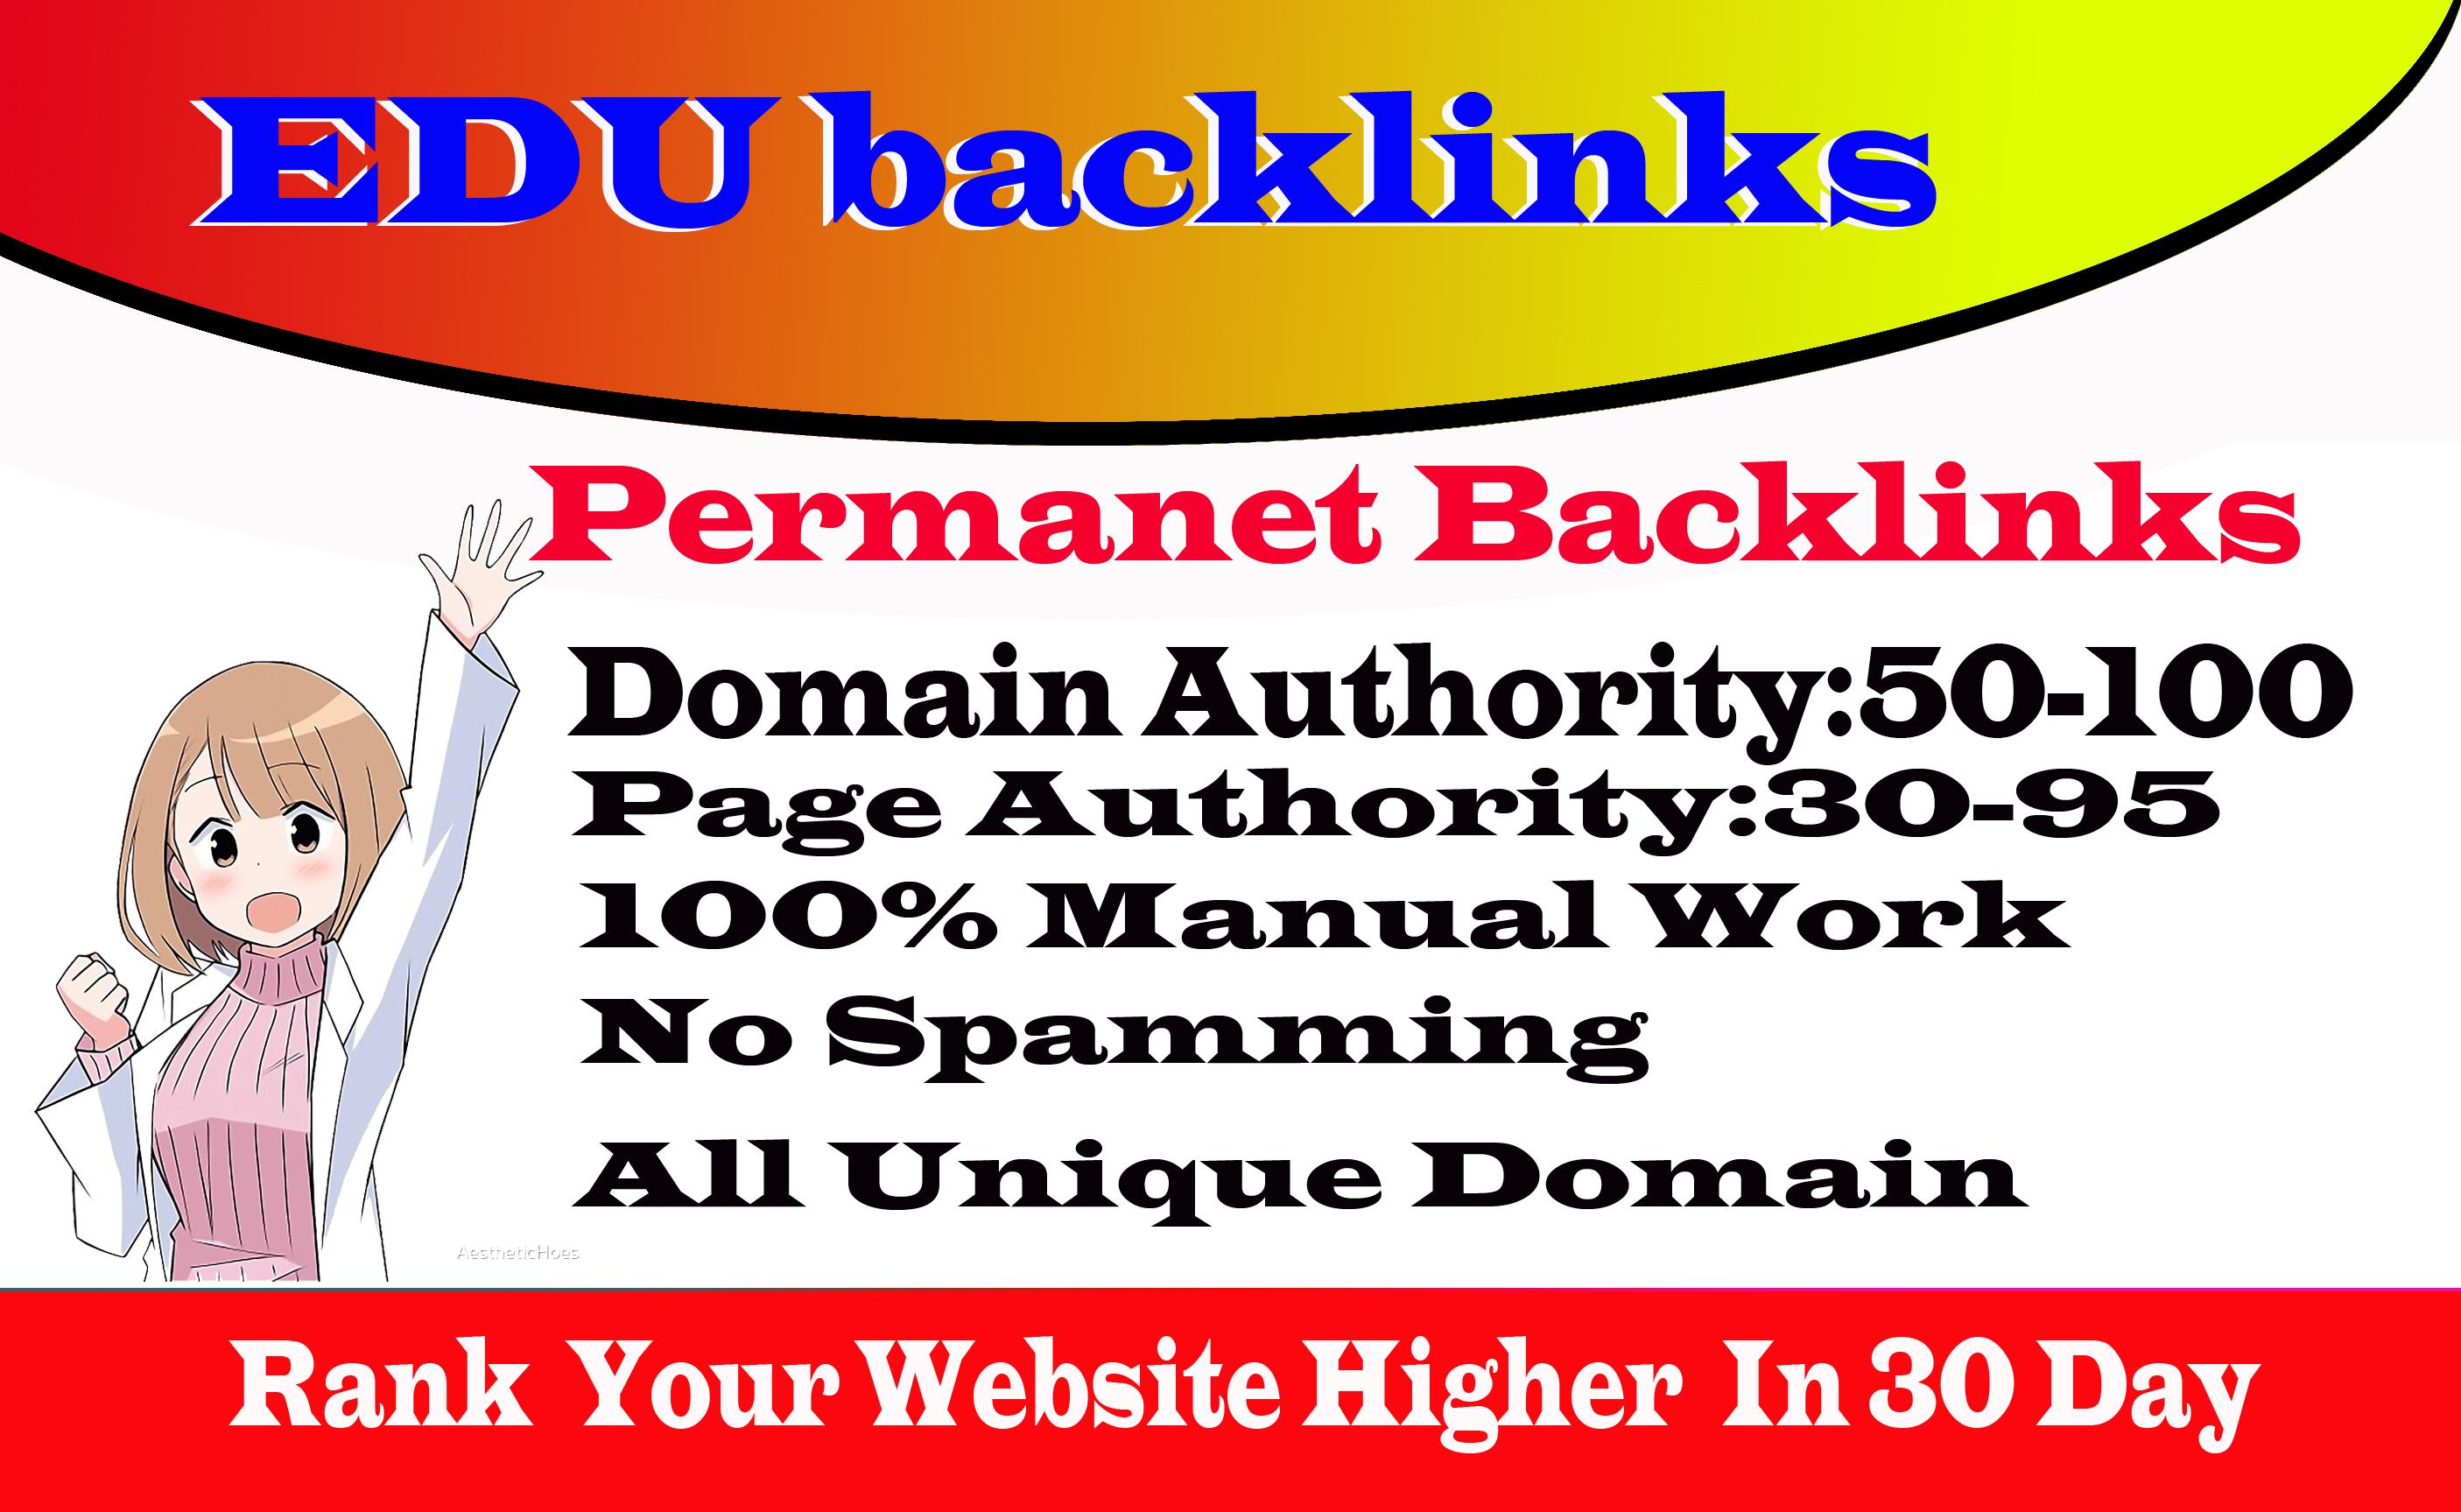 I Will Create 10 HQ SEO Edu Link Building From DA70+ Domains